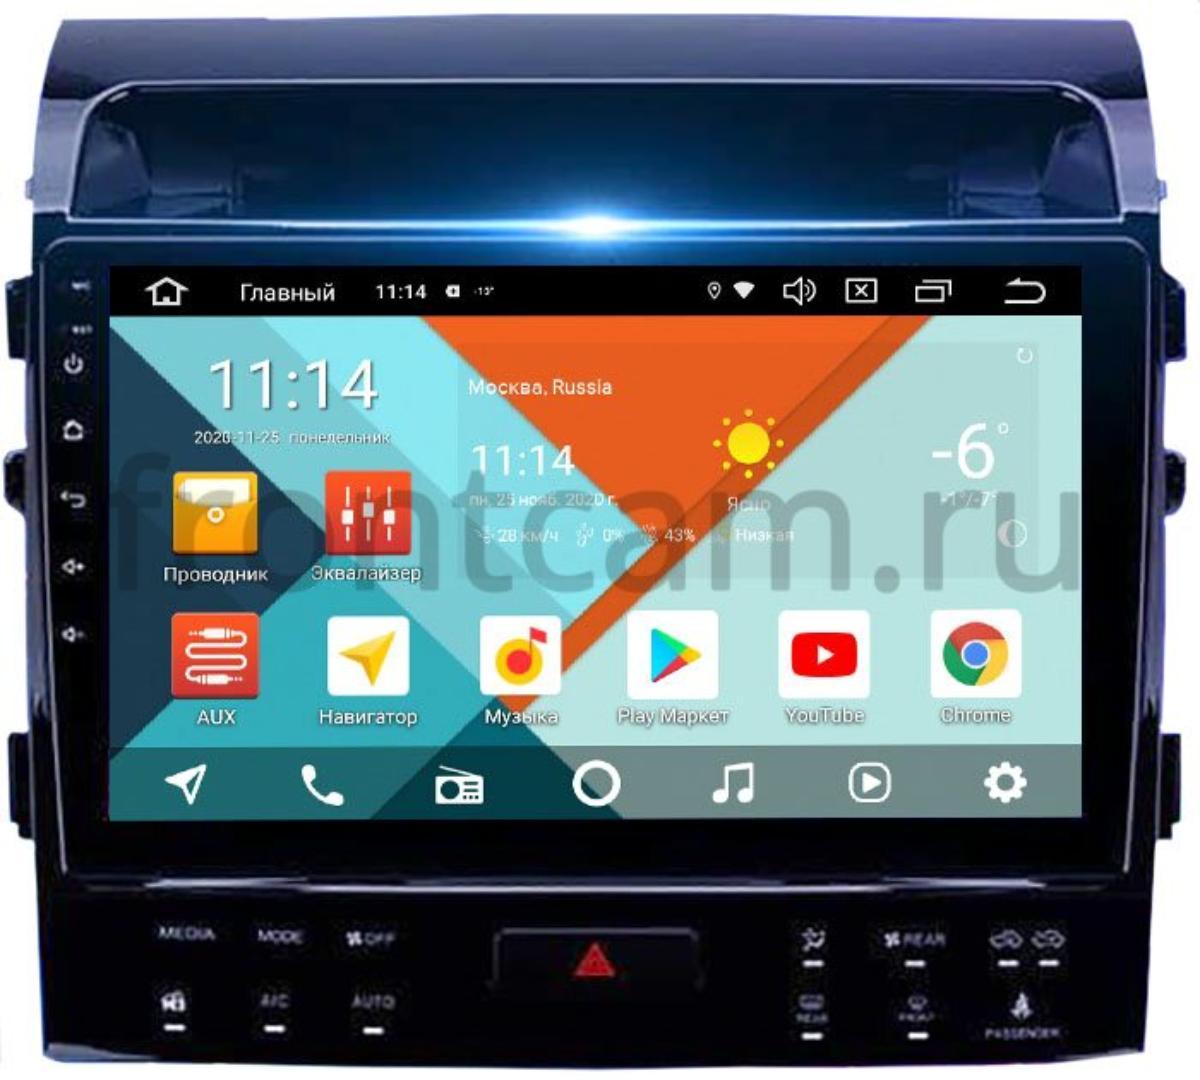 Штатная магнитола Toyota LC 200 2007-2015 (для авто с JBL) Wide Media KS10-toyota-lc200-QR-3/32 DSP CarPlay 4G-SIM Android 10 (API 29) (+ Камера заднего вида в подарок!)